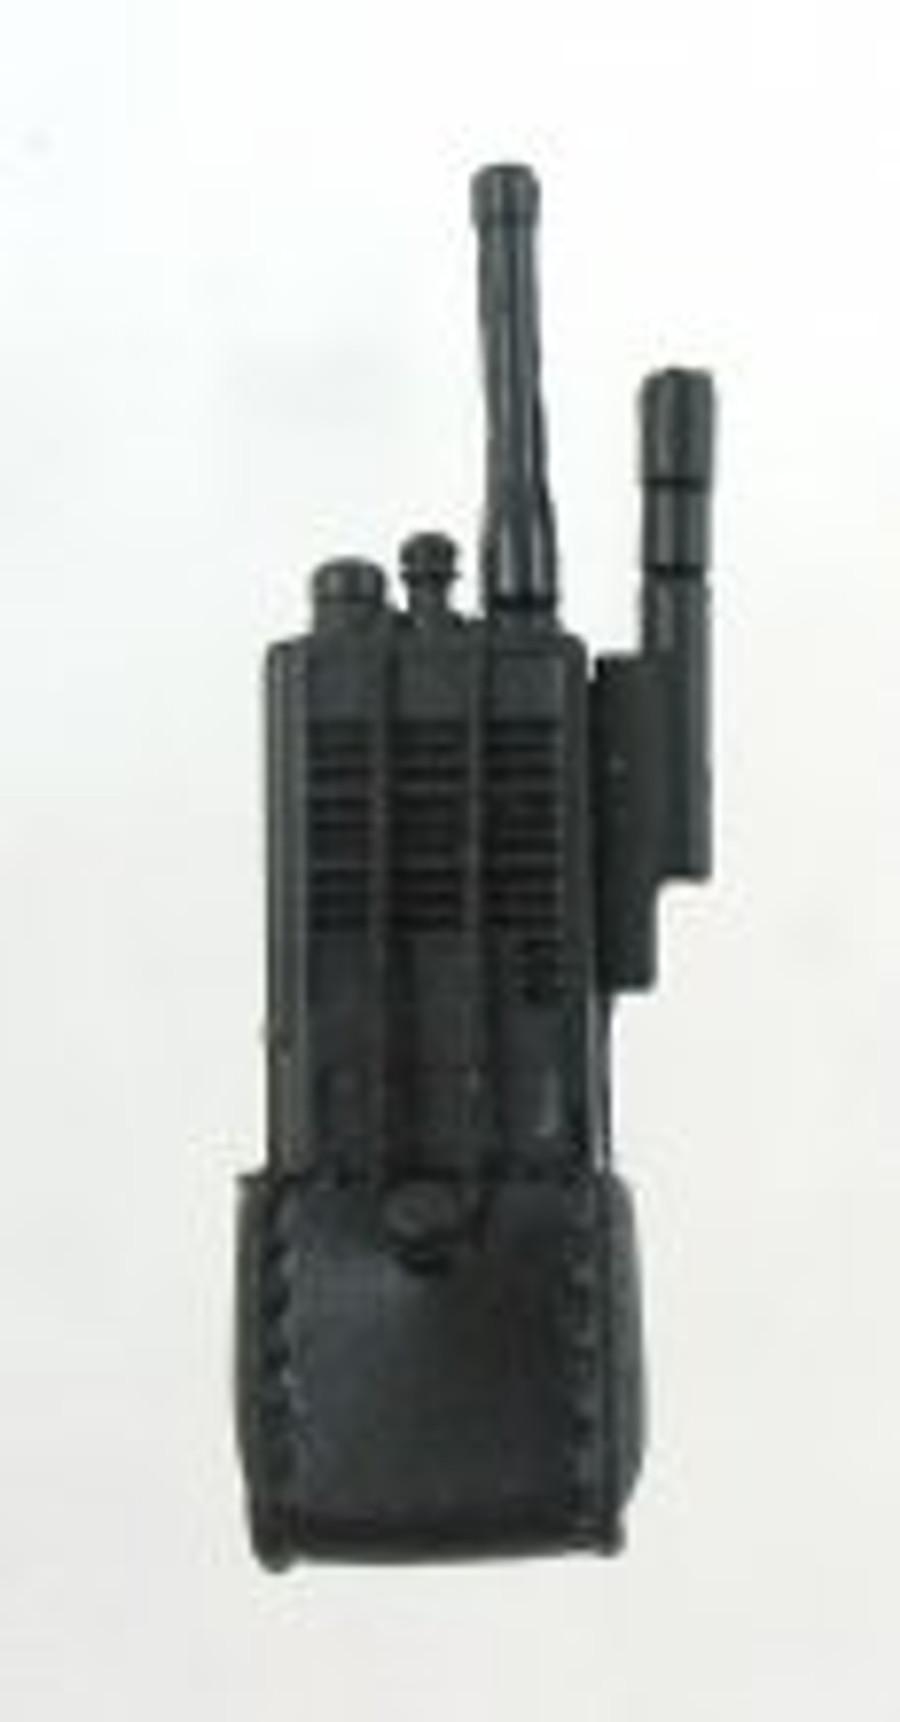 DML - Motorola MX300R Radio (with mic adaptor) with Pouch